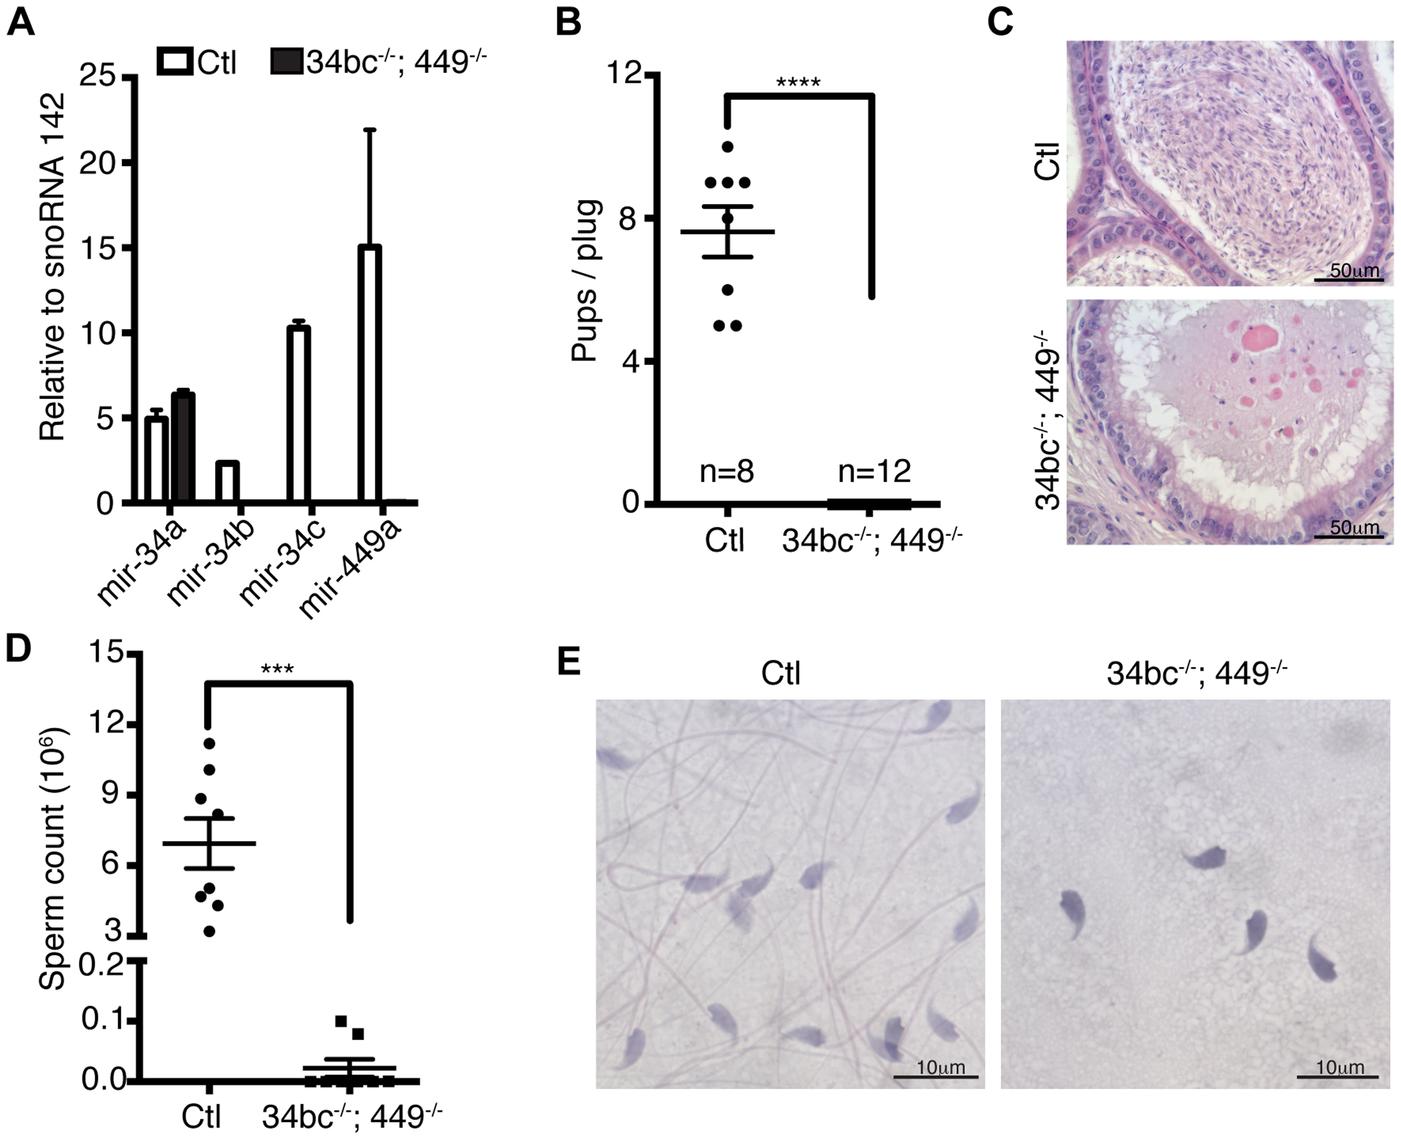 Oligoasthenoteratozoospermia and infertility in miR-34bc<sup>−/−</sup>;449<sup>−/−</sup> mice.